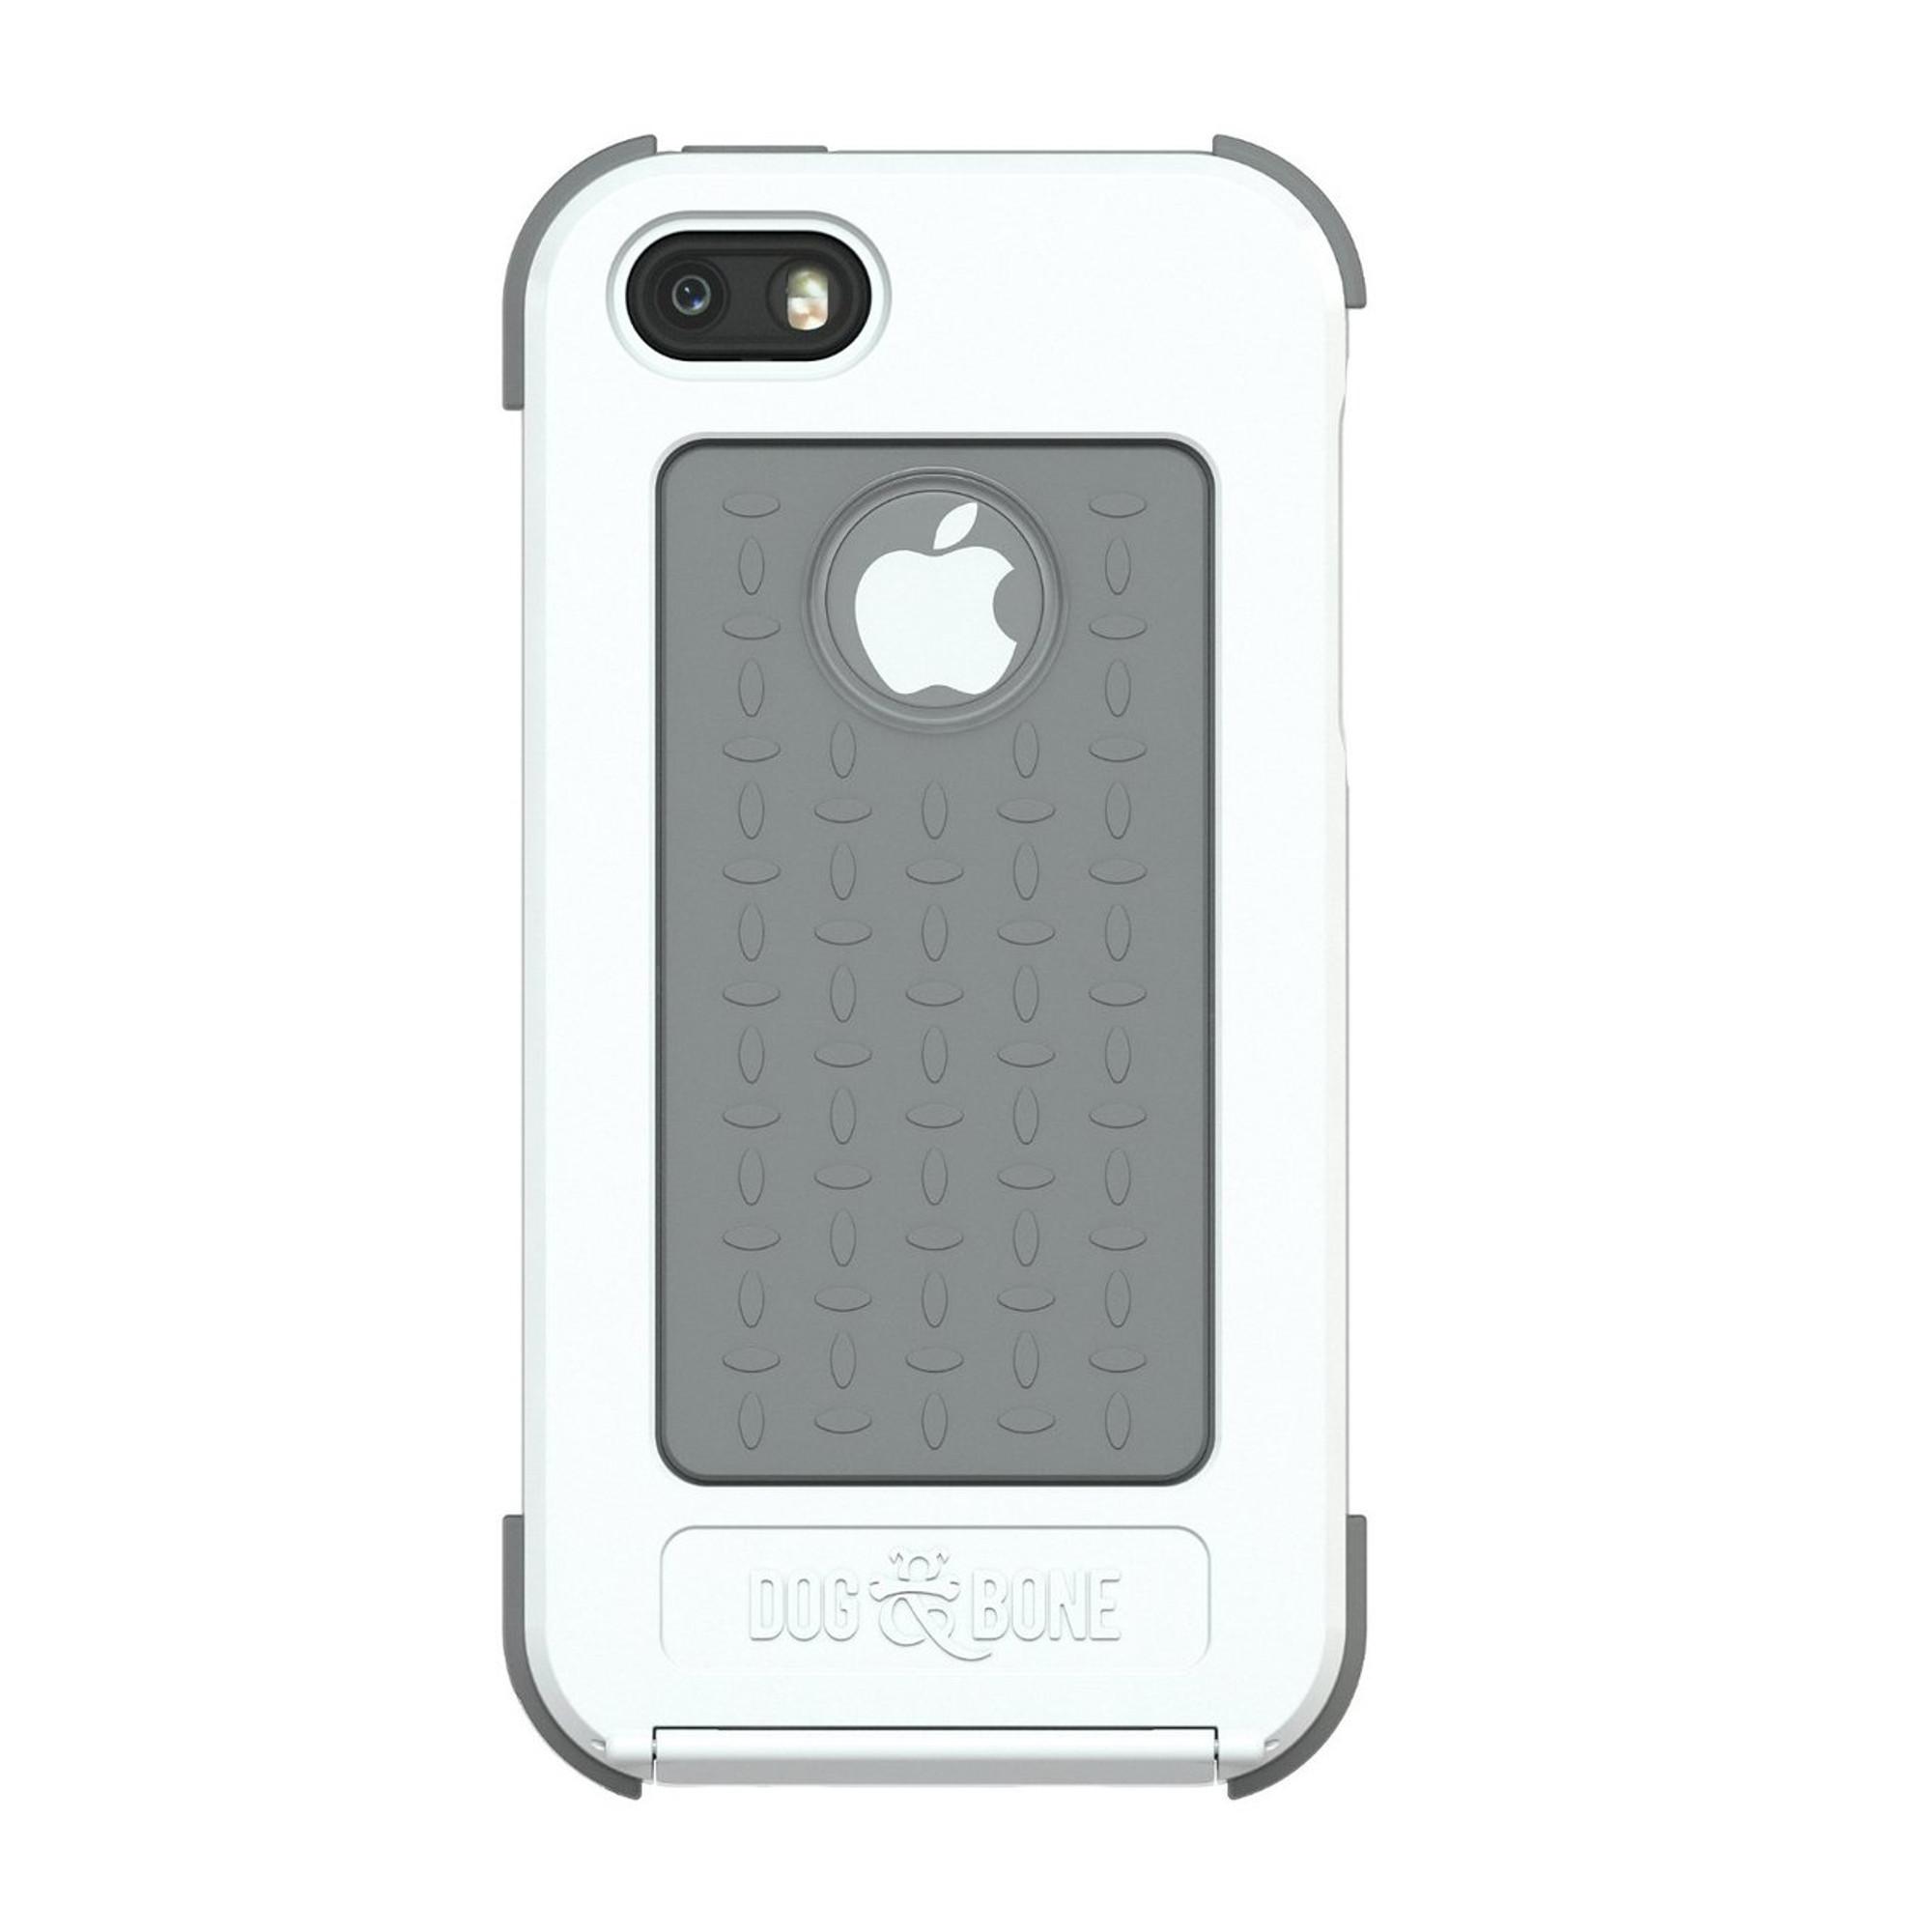 buy online 7eea6 ca264 Dog & Bone Wetsuit Waterproof Case for iPhone 5S / 5 - White / Grey